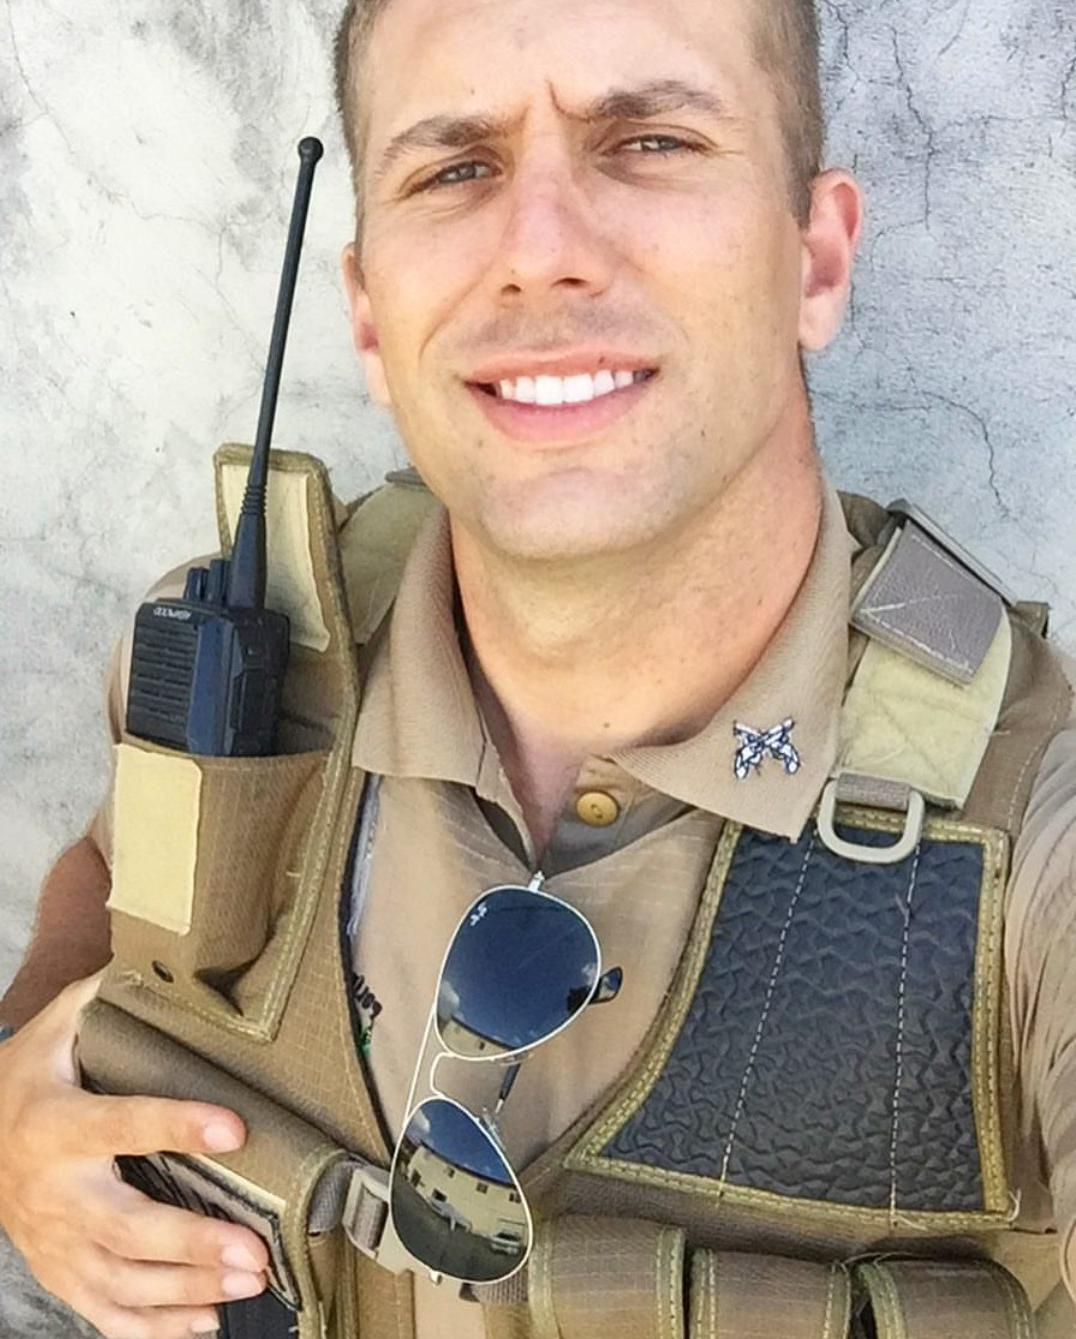 hot-brazilian-men-in-uniform-military-army-hunks-walkie-talkie-sunglasses-beautiful-smile